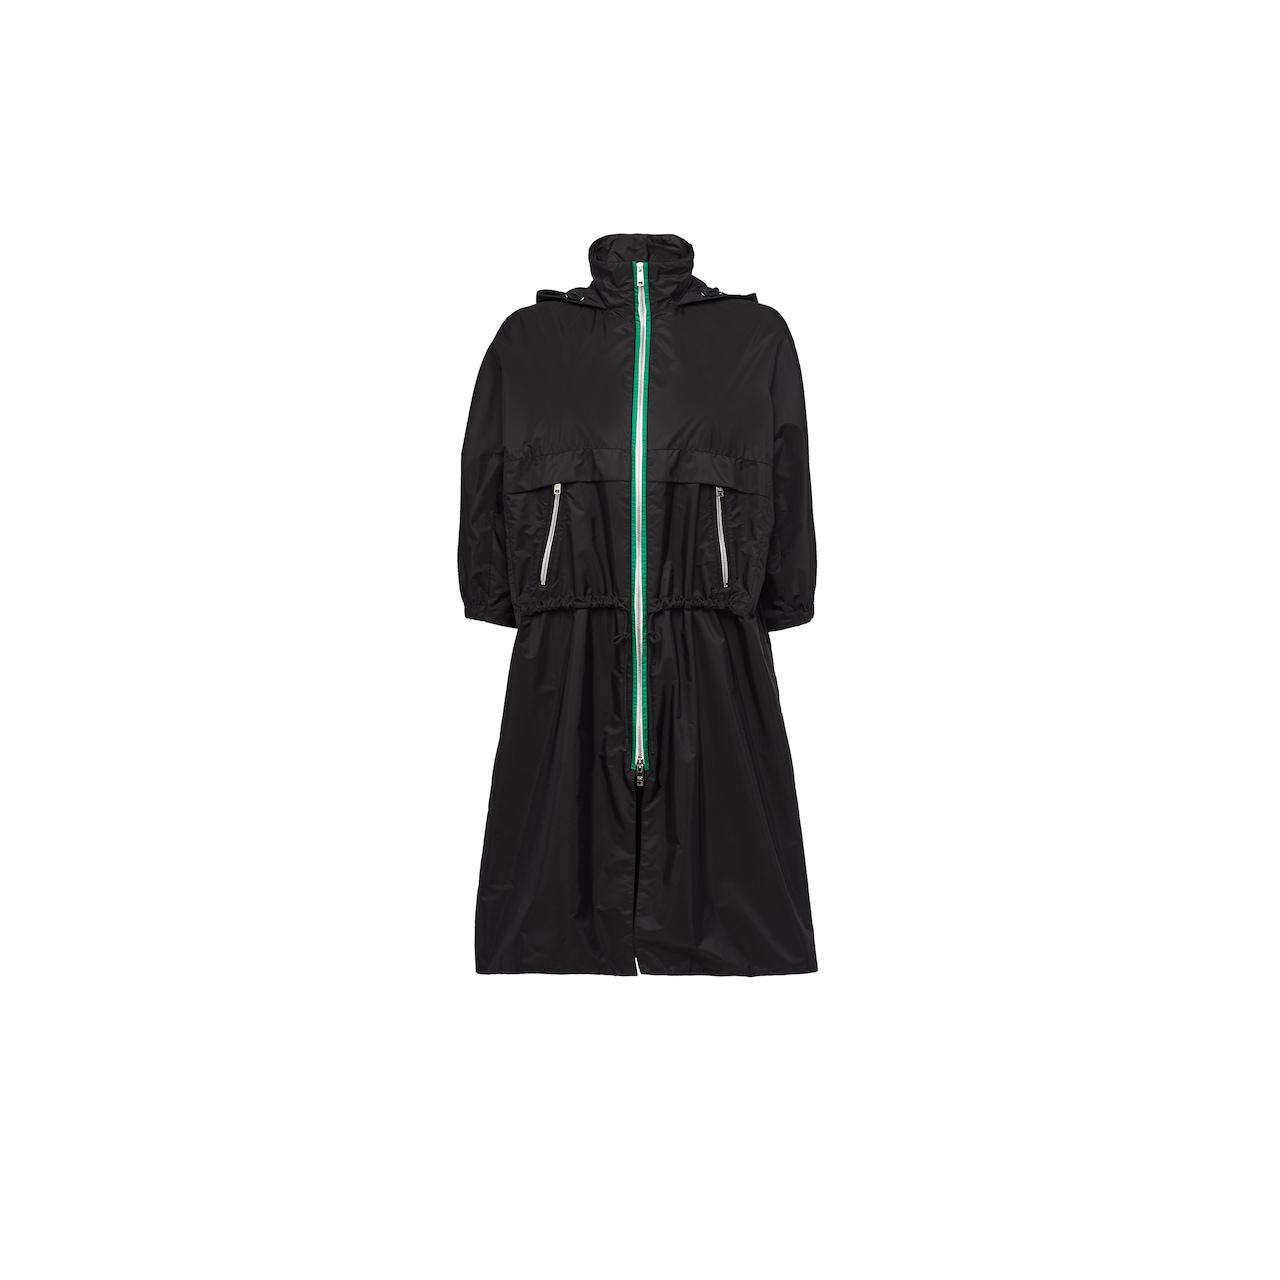 Feather nylon raincoat